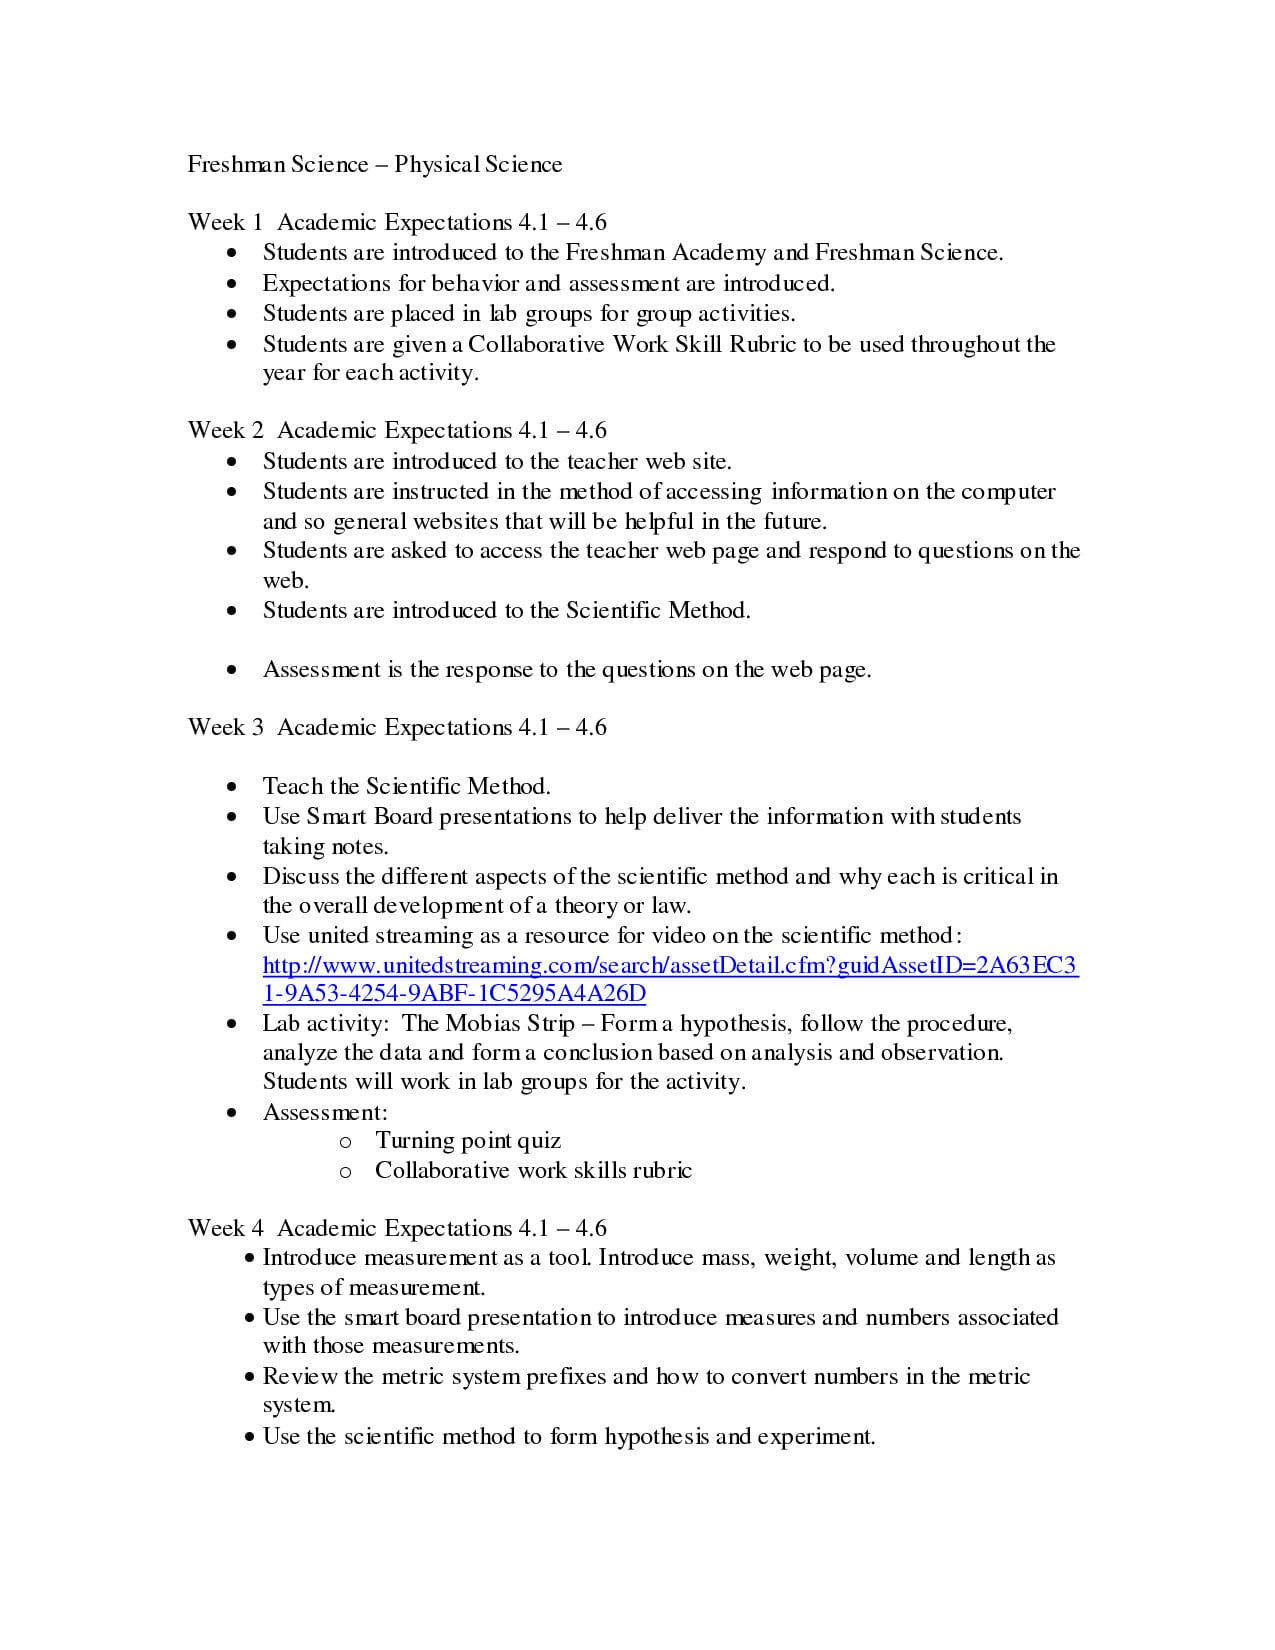 Brilliant Ideas Of Kids Science Skills Worksheet Worksheets For All Inside Science Skills Worksheet Answer Key